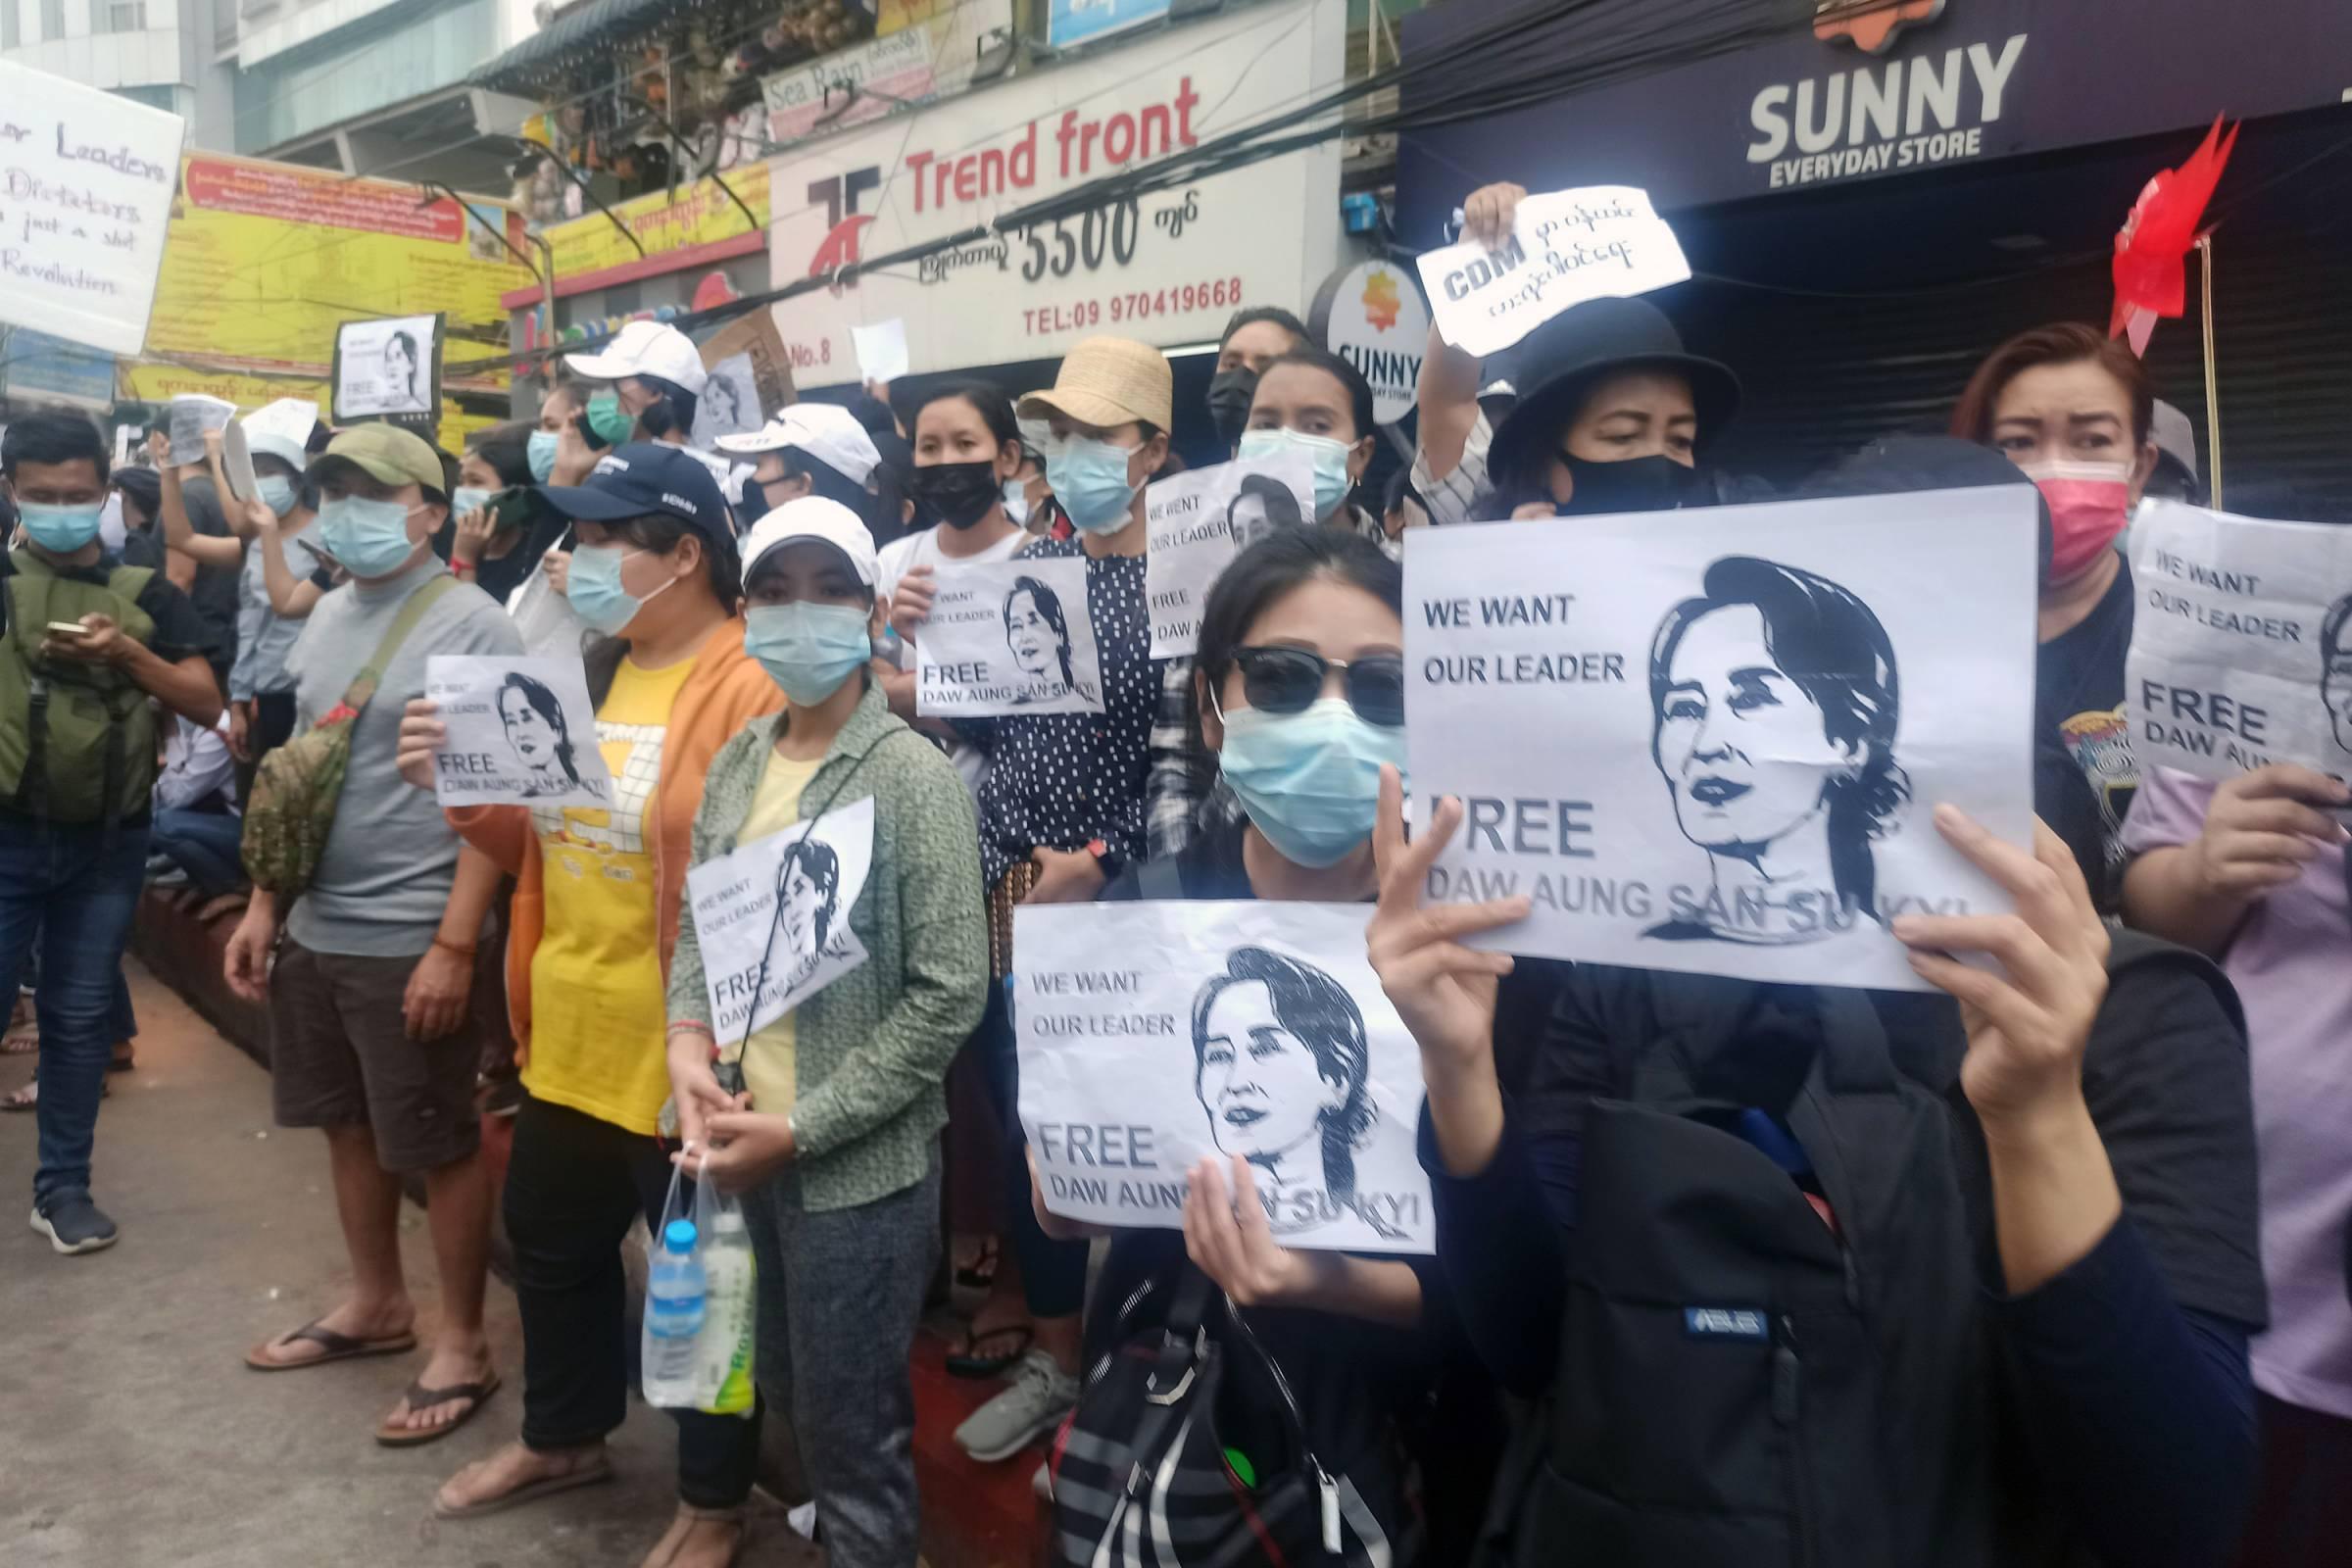 hub.jhu.edu: A week after Myanmar coup, tensions still rising